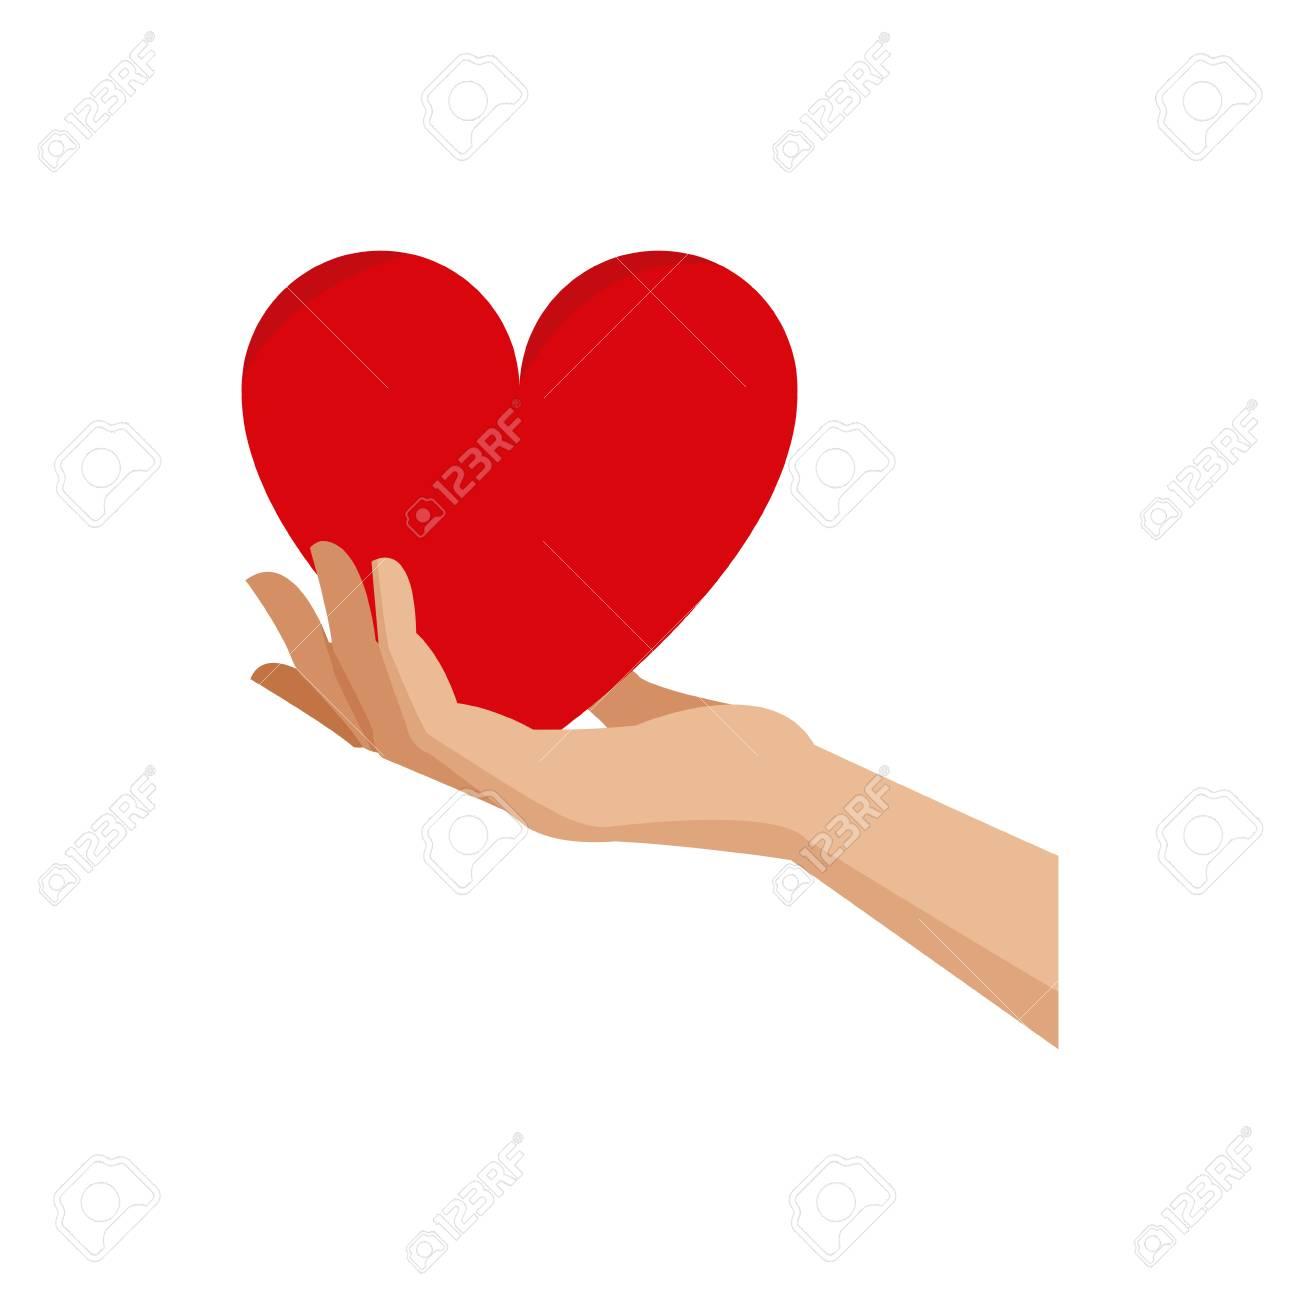 Hand holding heart blood donation symbol vector illustration hand holding heart blood donation symbol vector illustration stock vector 77529319 buycottarizona